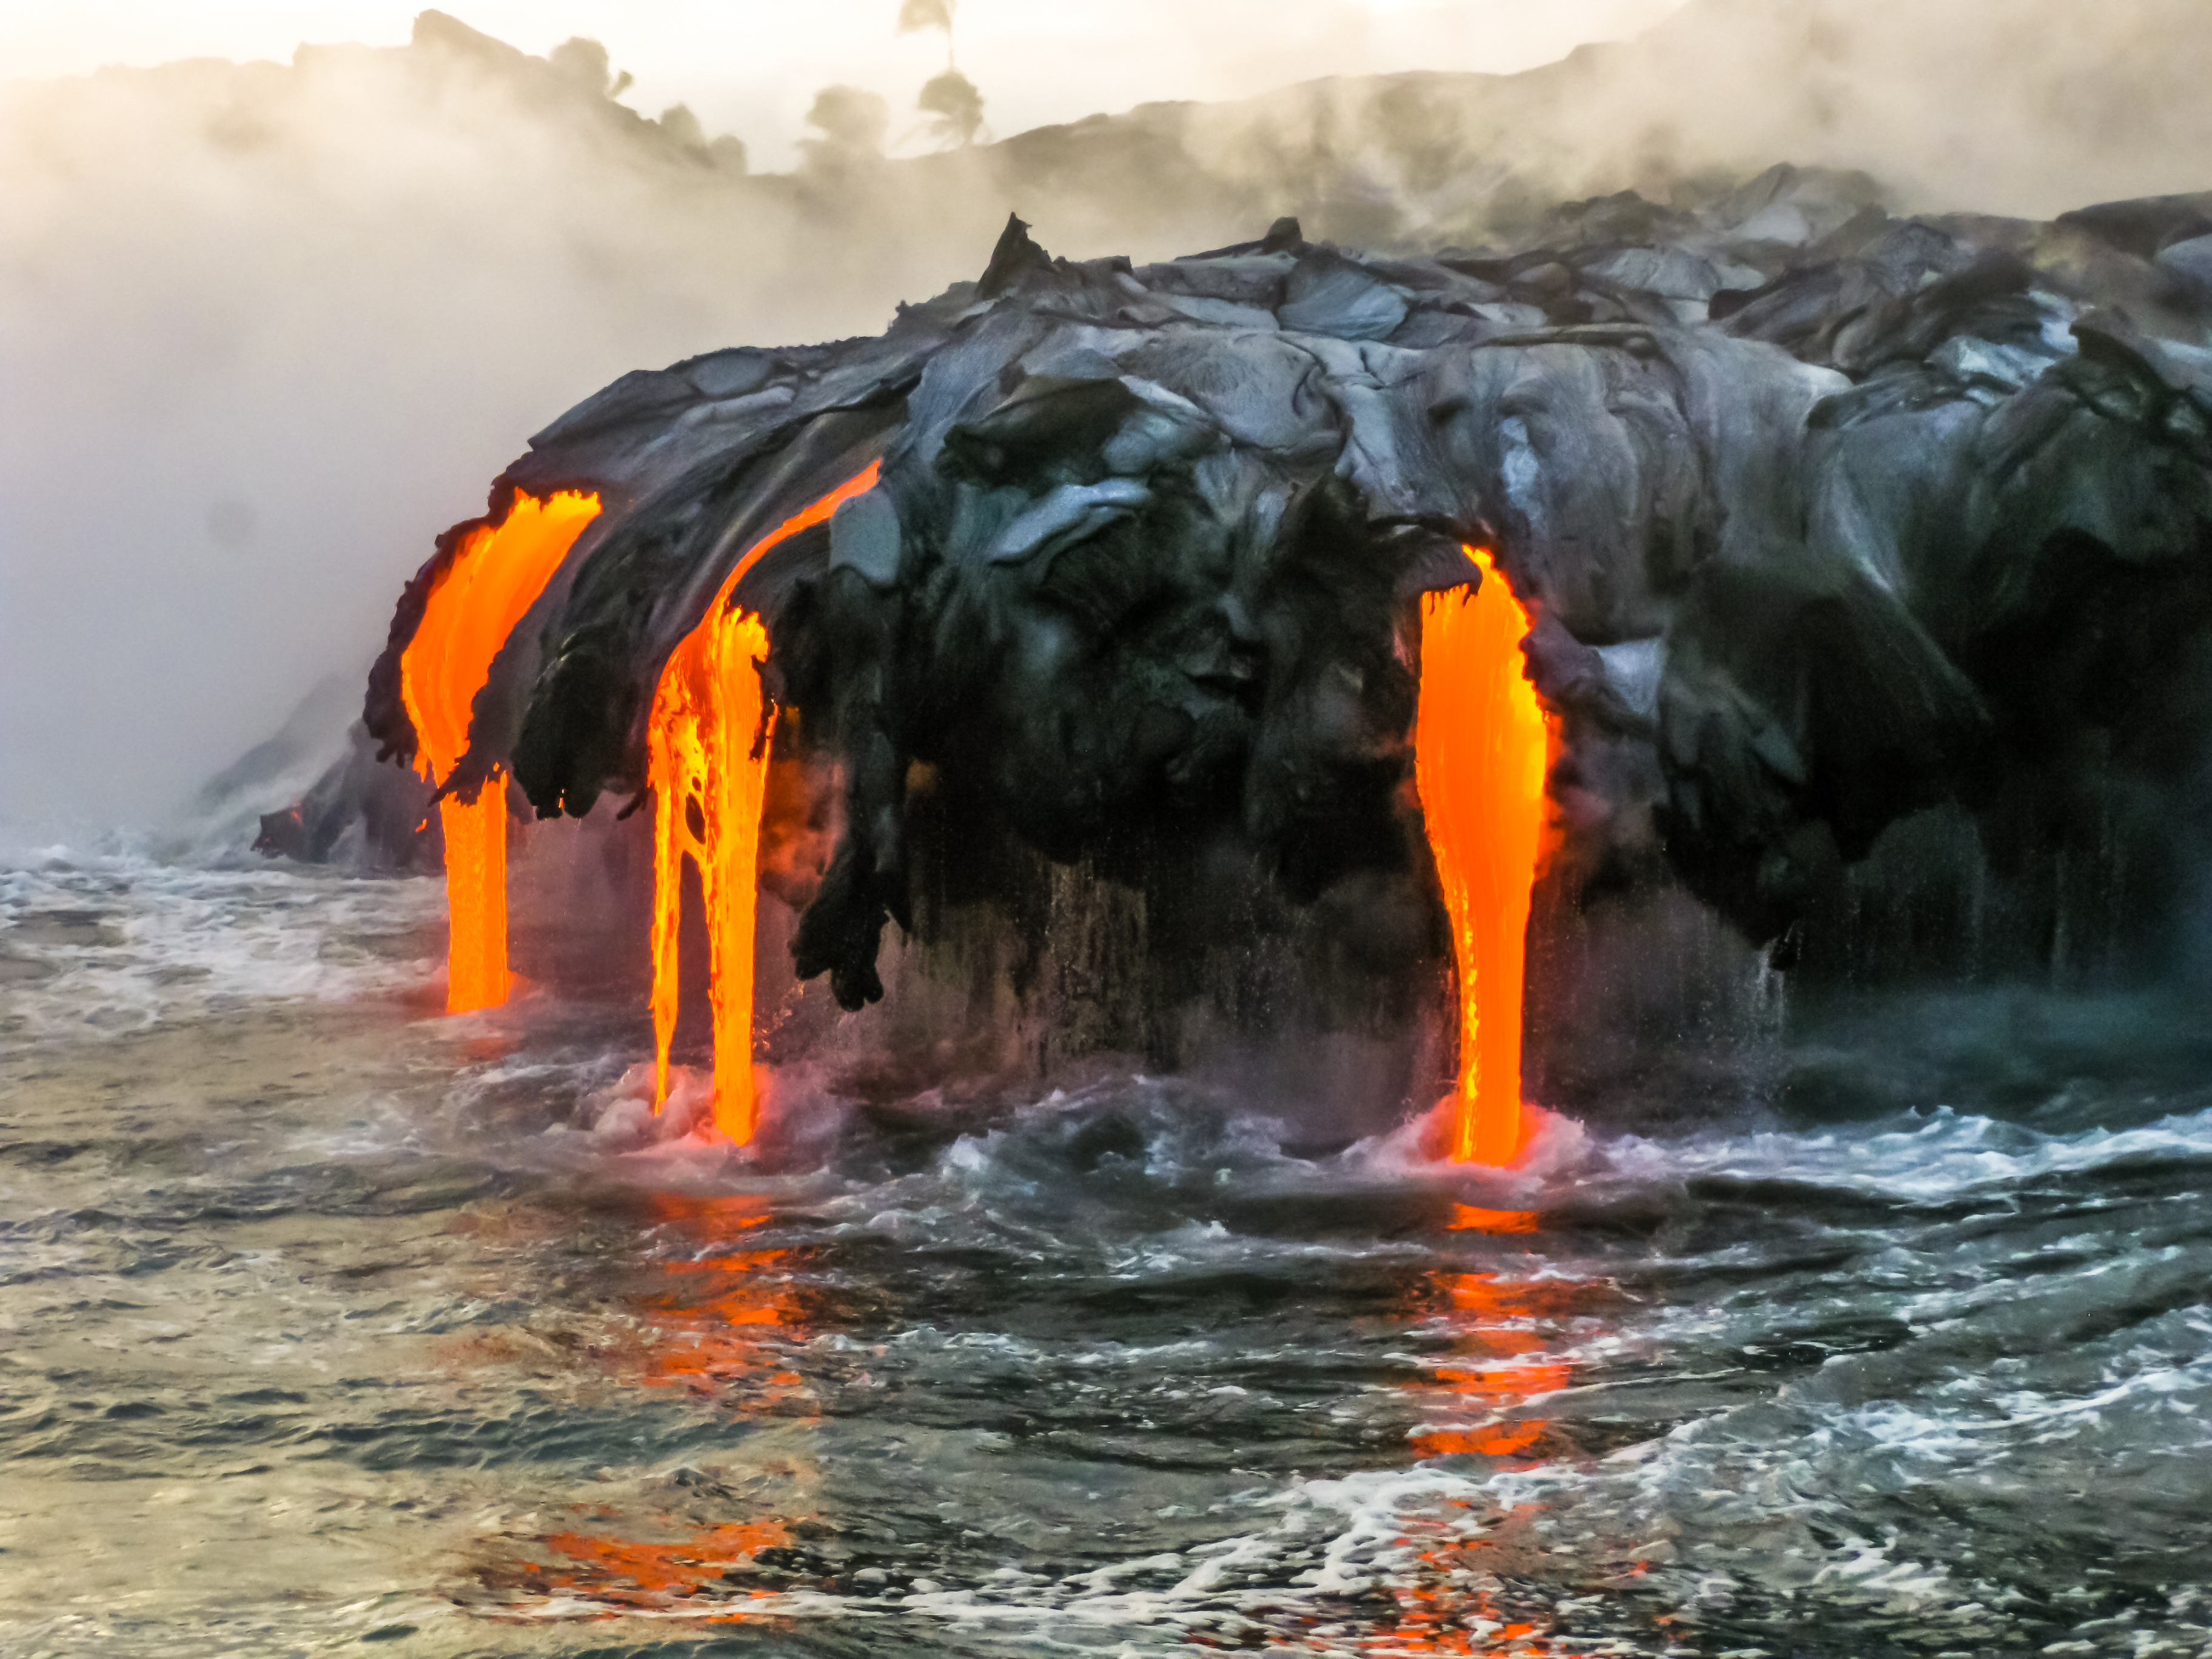 What Kind of Damage Has Mauna Loa Caused? | USA Today